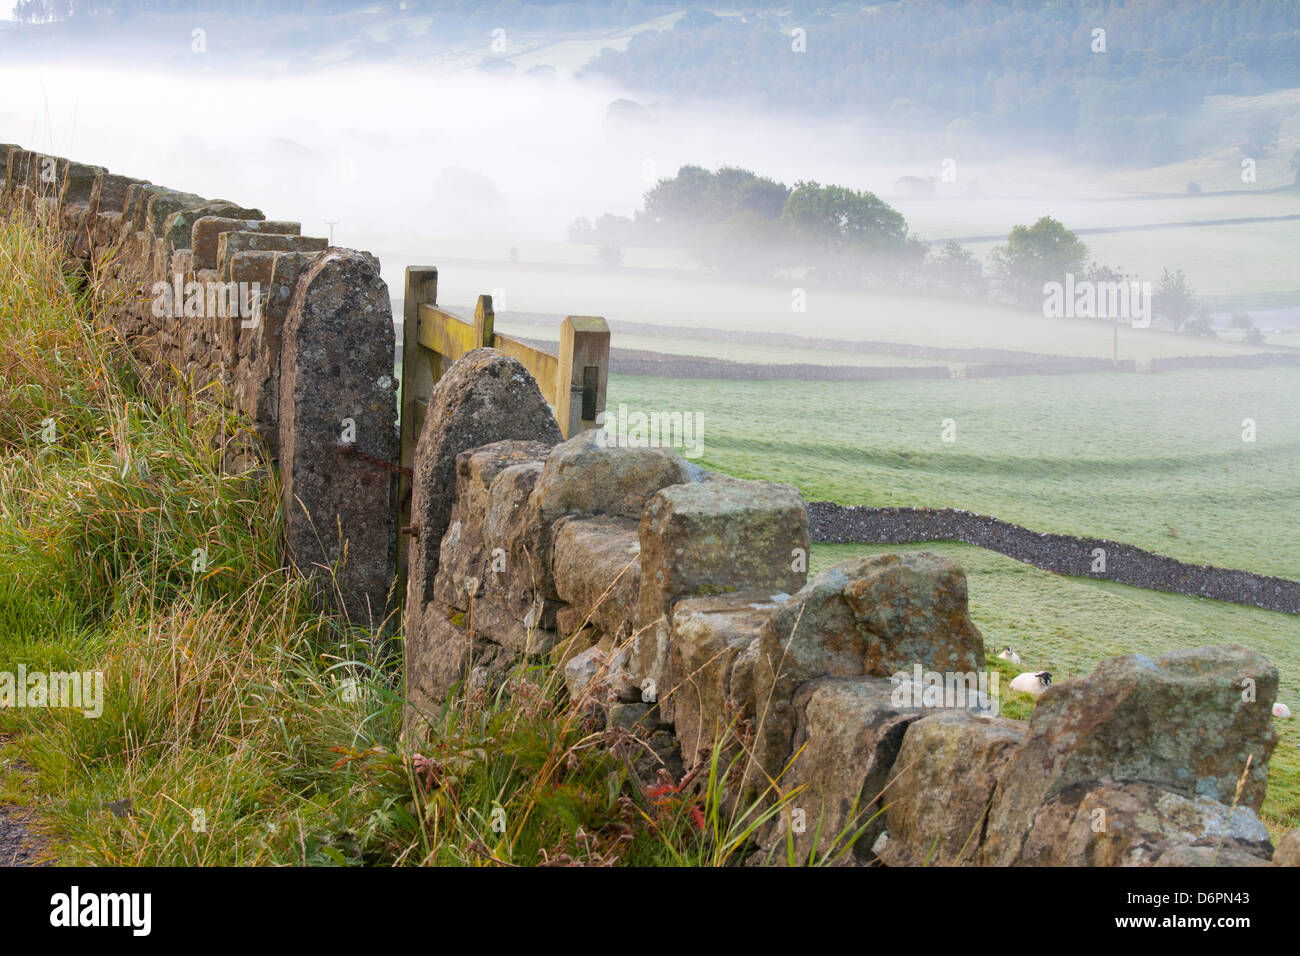 La valla de piedra, Burnsall, Yorkshire Dales National Park, Yorkshire, Inglaterra, Reino Unido, Europa Imagen De Stock